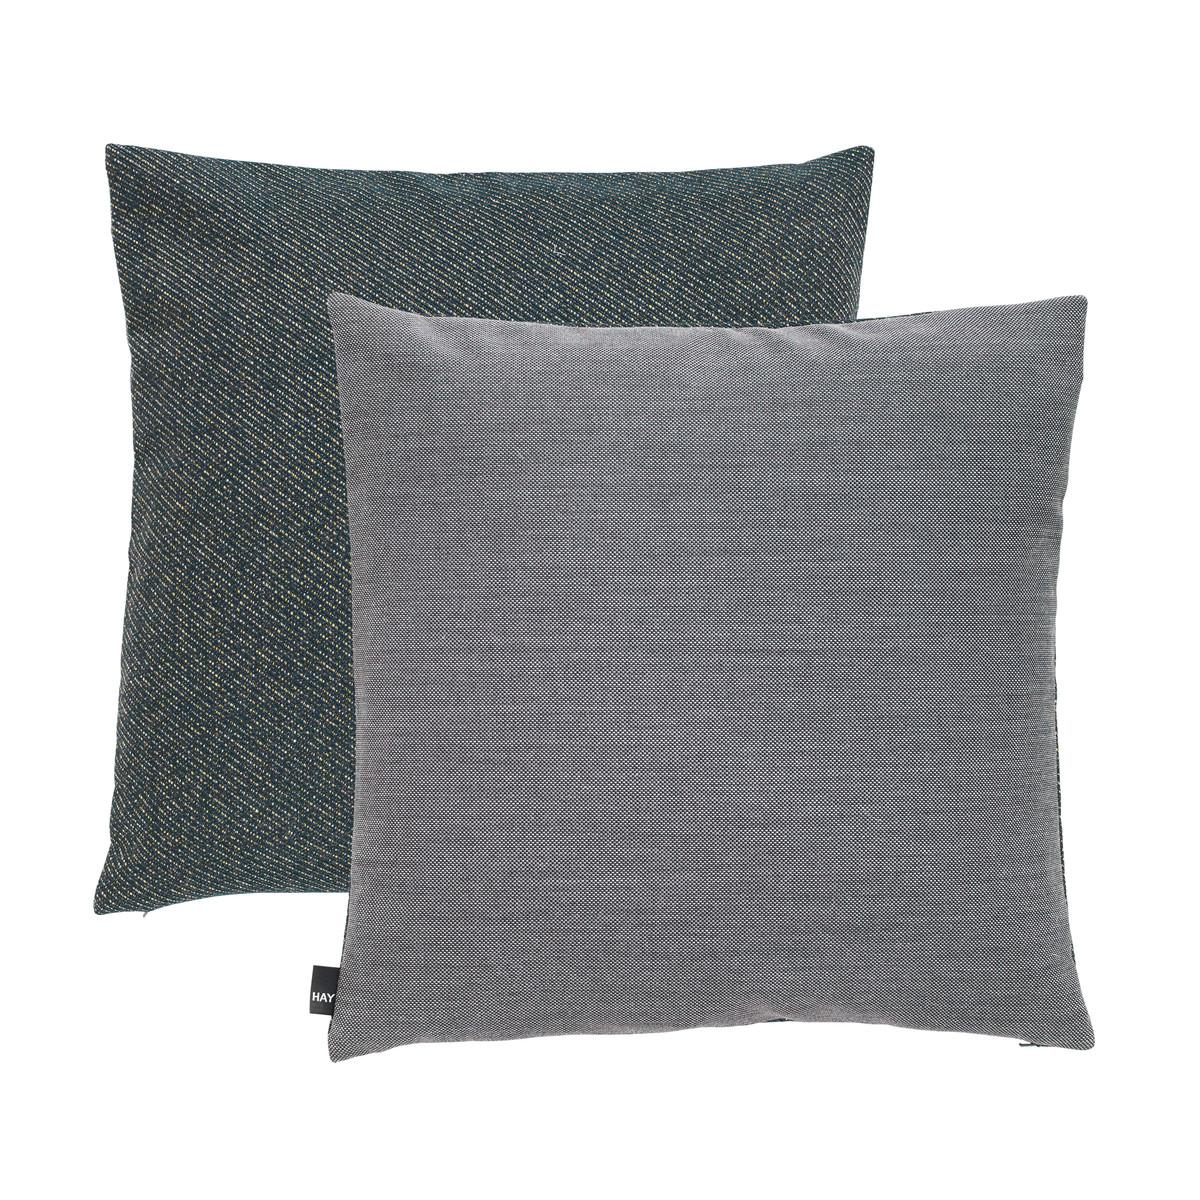 hay kissen eclectic 50 x 50 cm dunkelgrau dunkelgrau t. Black Bedroom Furniture Sets. Home Design Ideas